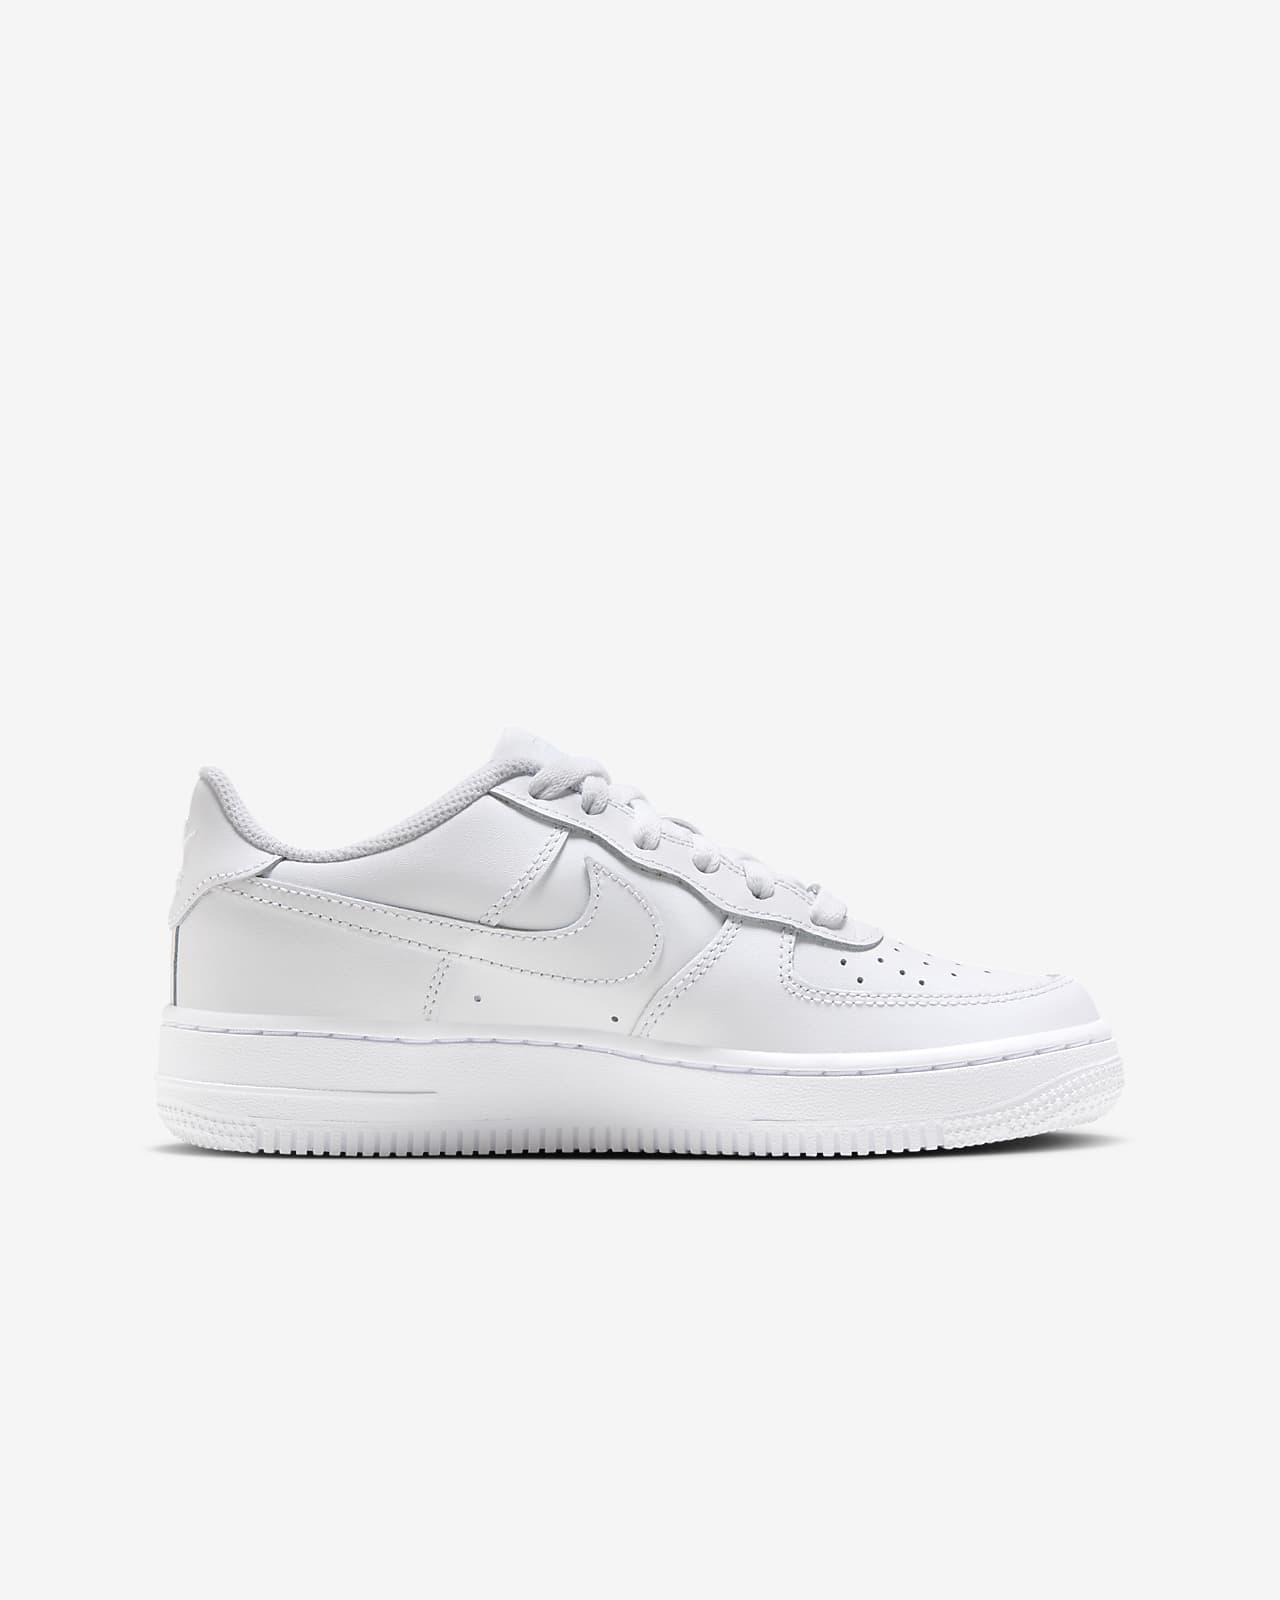 Nike Air Force 1 LE Big Kids' Shoes